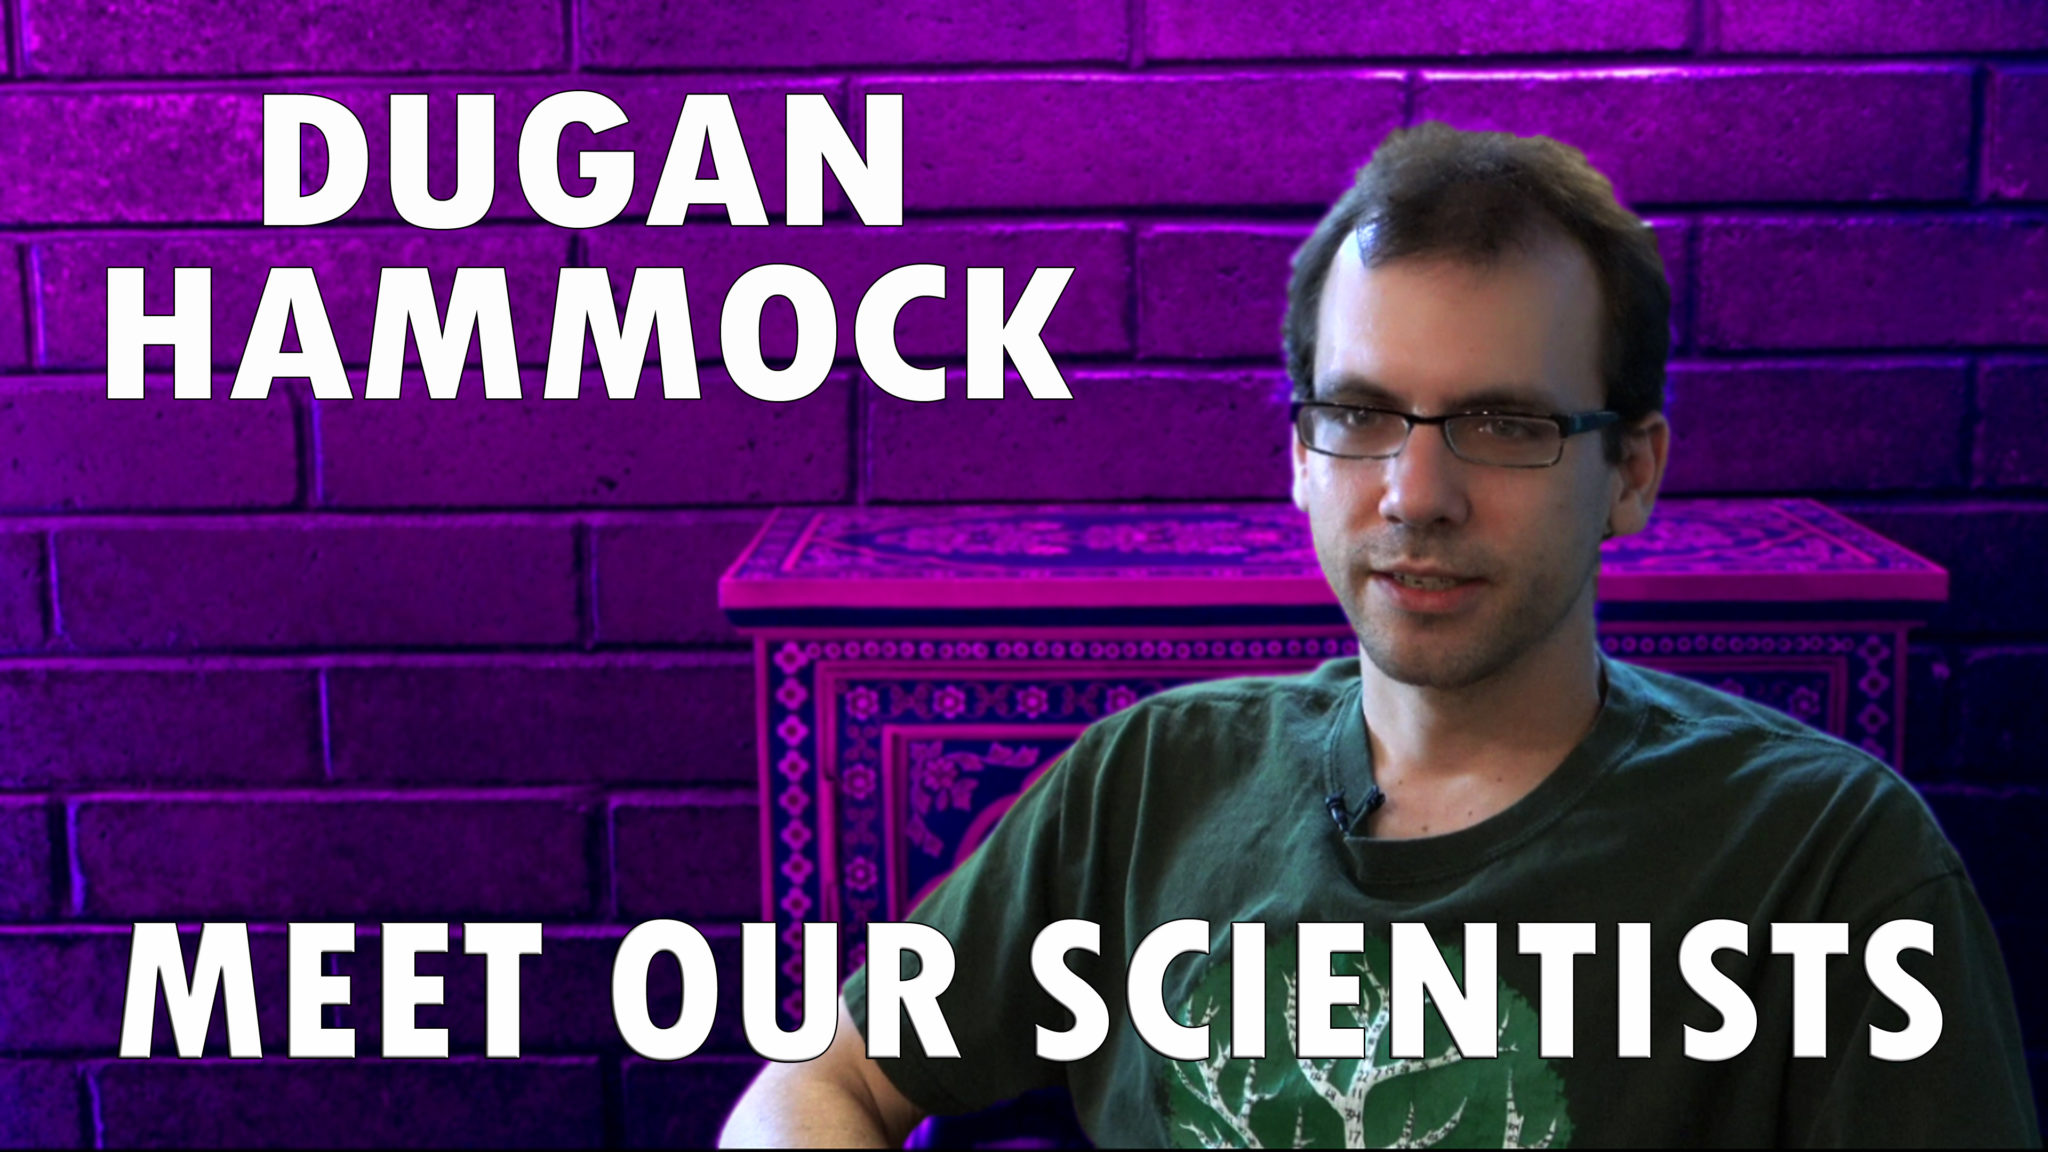 Dugan Hammock